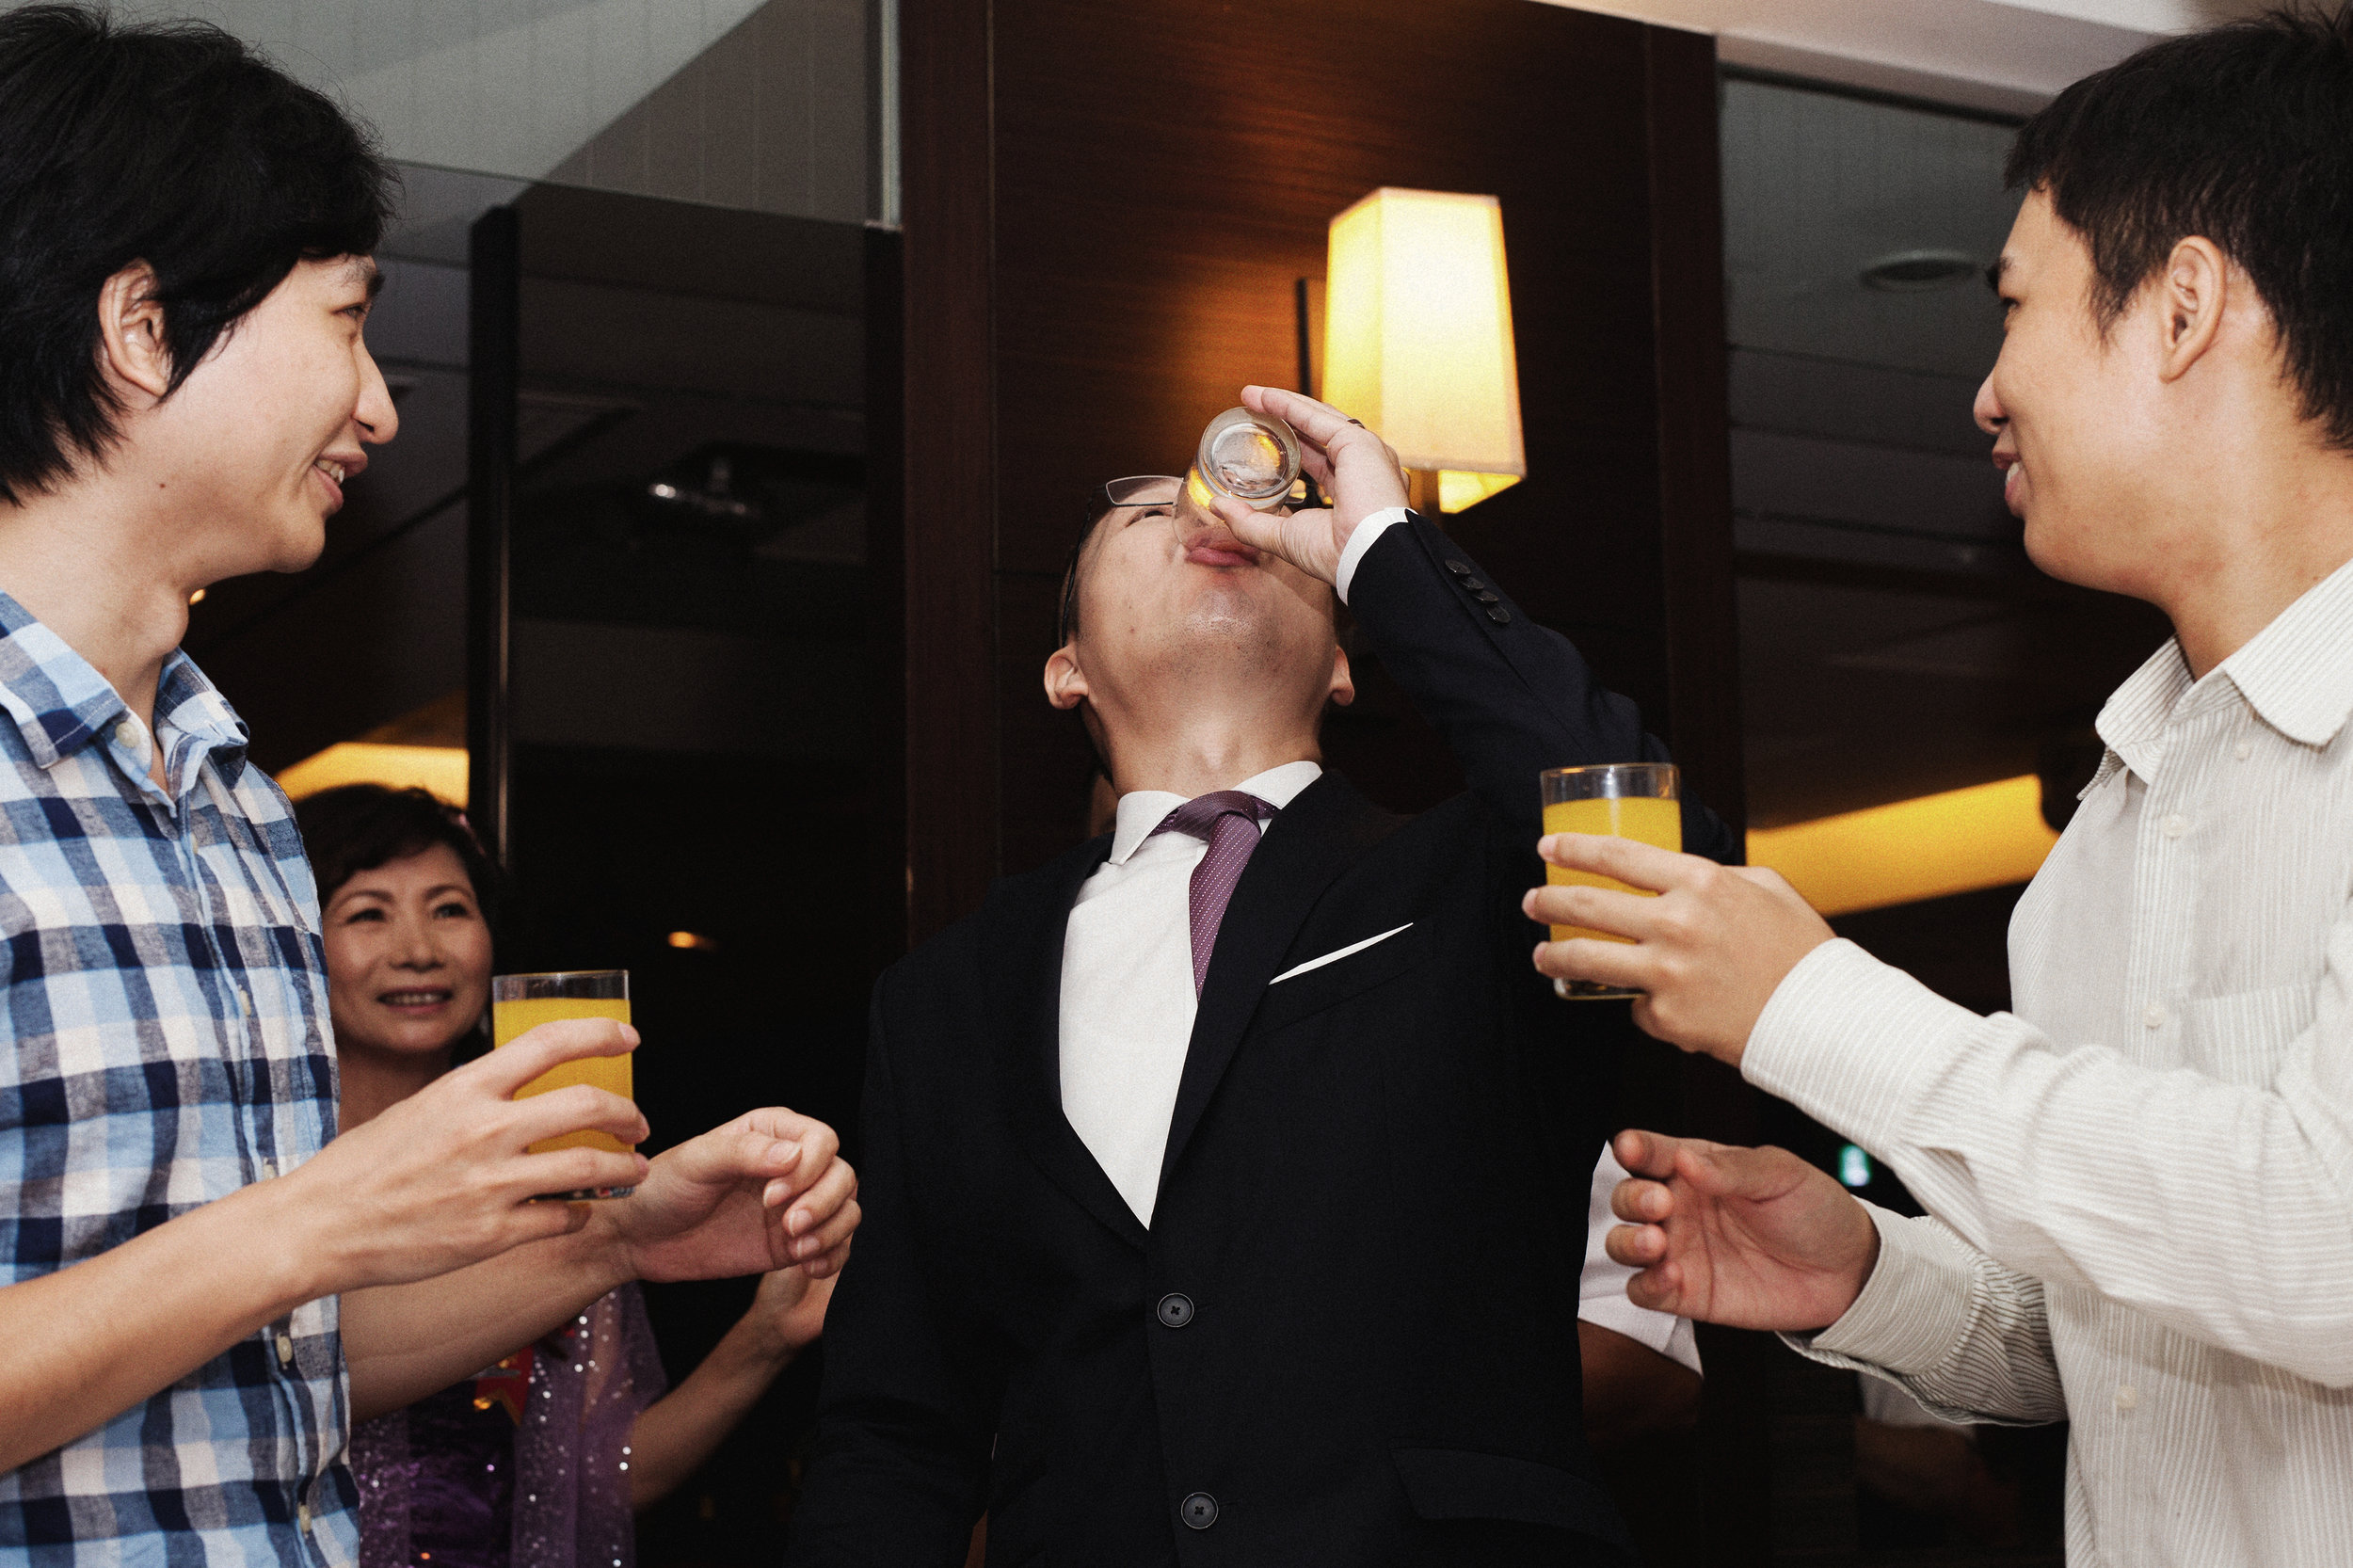 [JC]CREATIVE 女性攝影師 北投儷宴會館 補請台灣WEDDING    自然風格 台北婚攝推 女婚攝  桃園婚攝   圖像00352.JPG